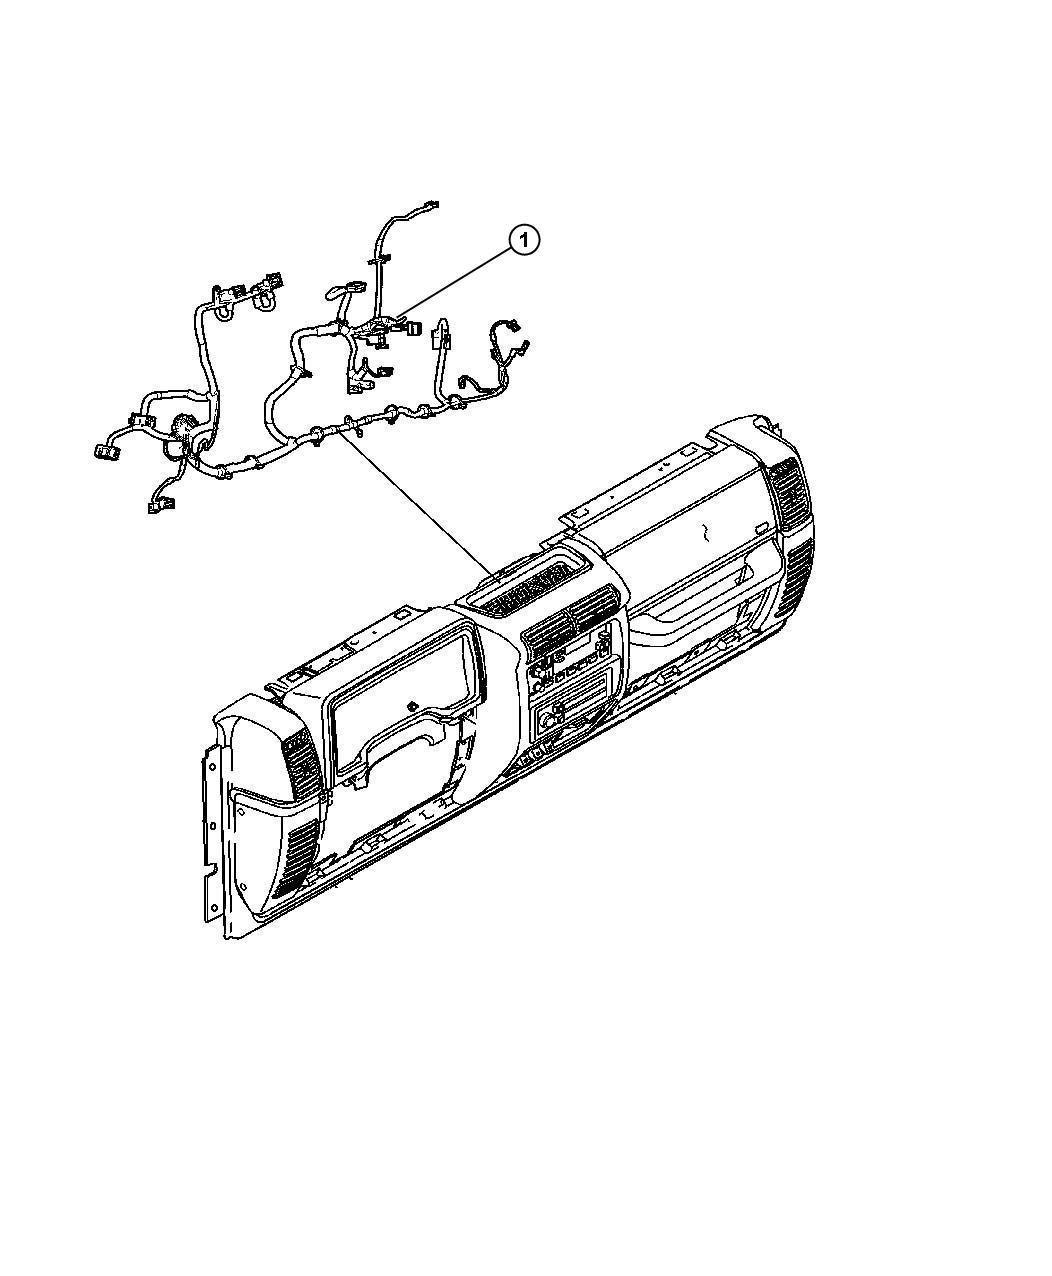 2010 Jeep Wrangler Wiring. Instrument panel. [[pwr windows